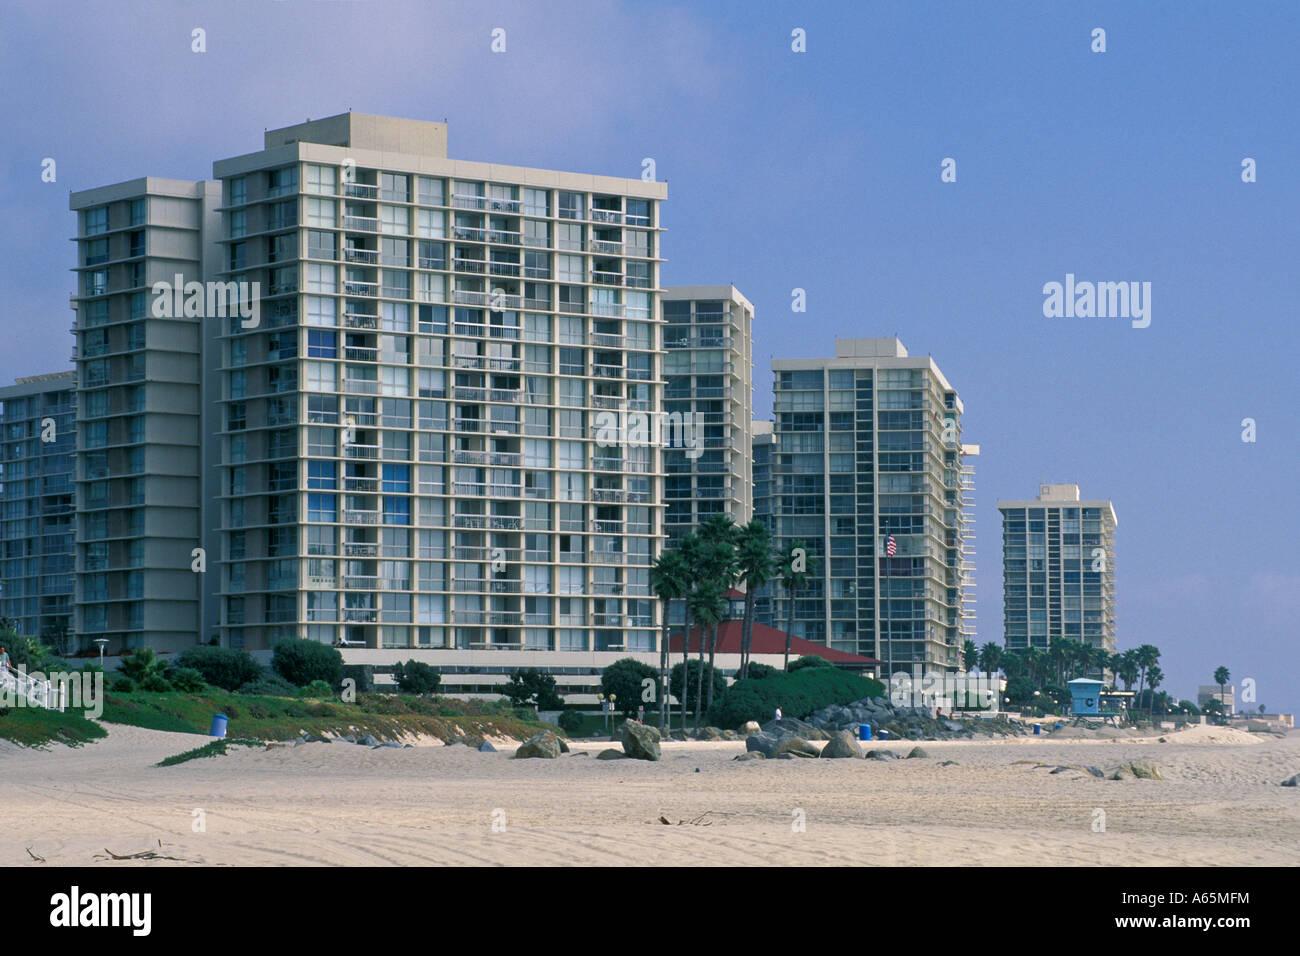 Apartment buildings along coronado beach coronado san - Apartment buildings san diego ...